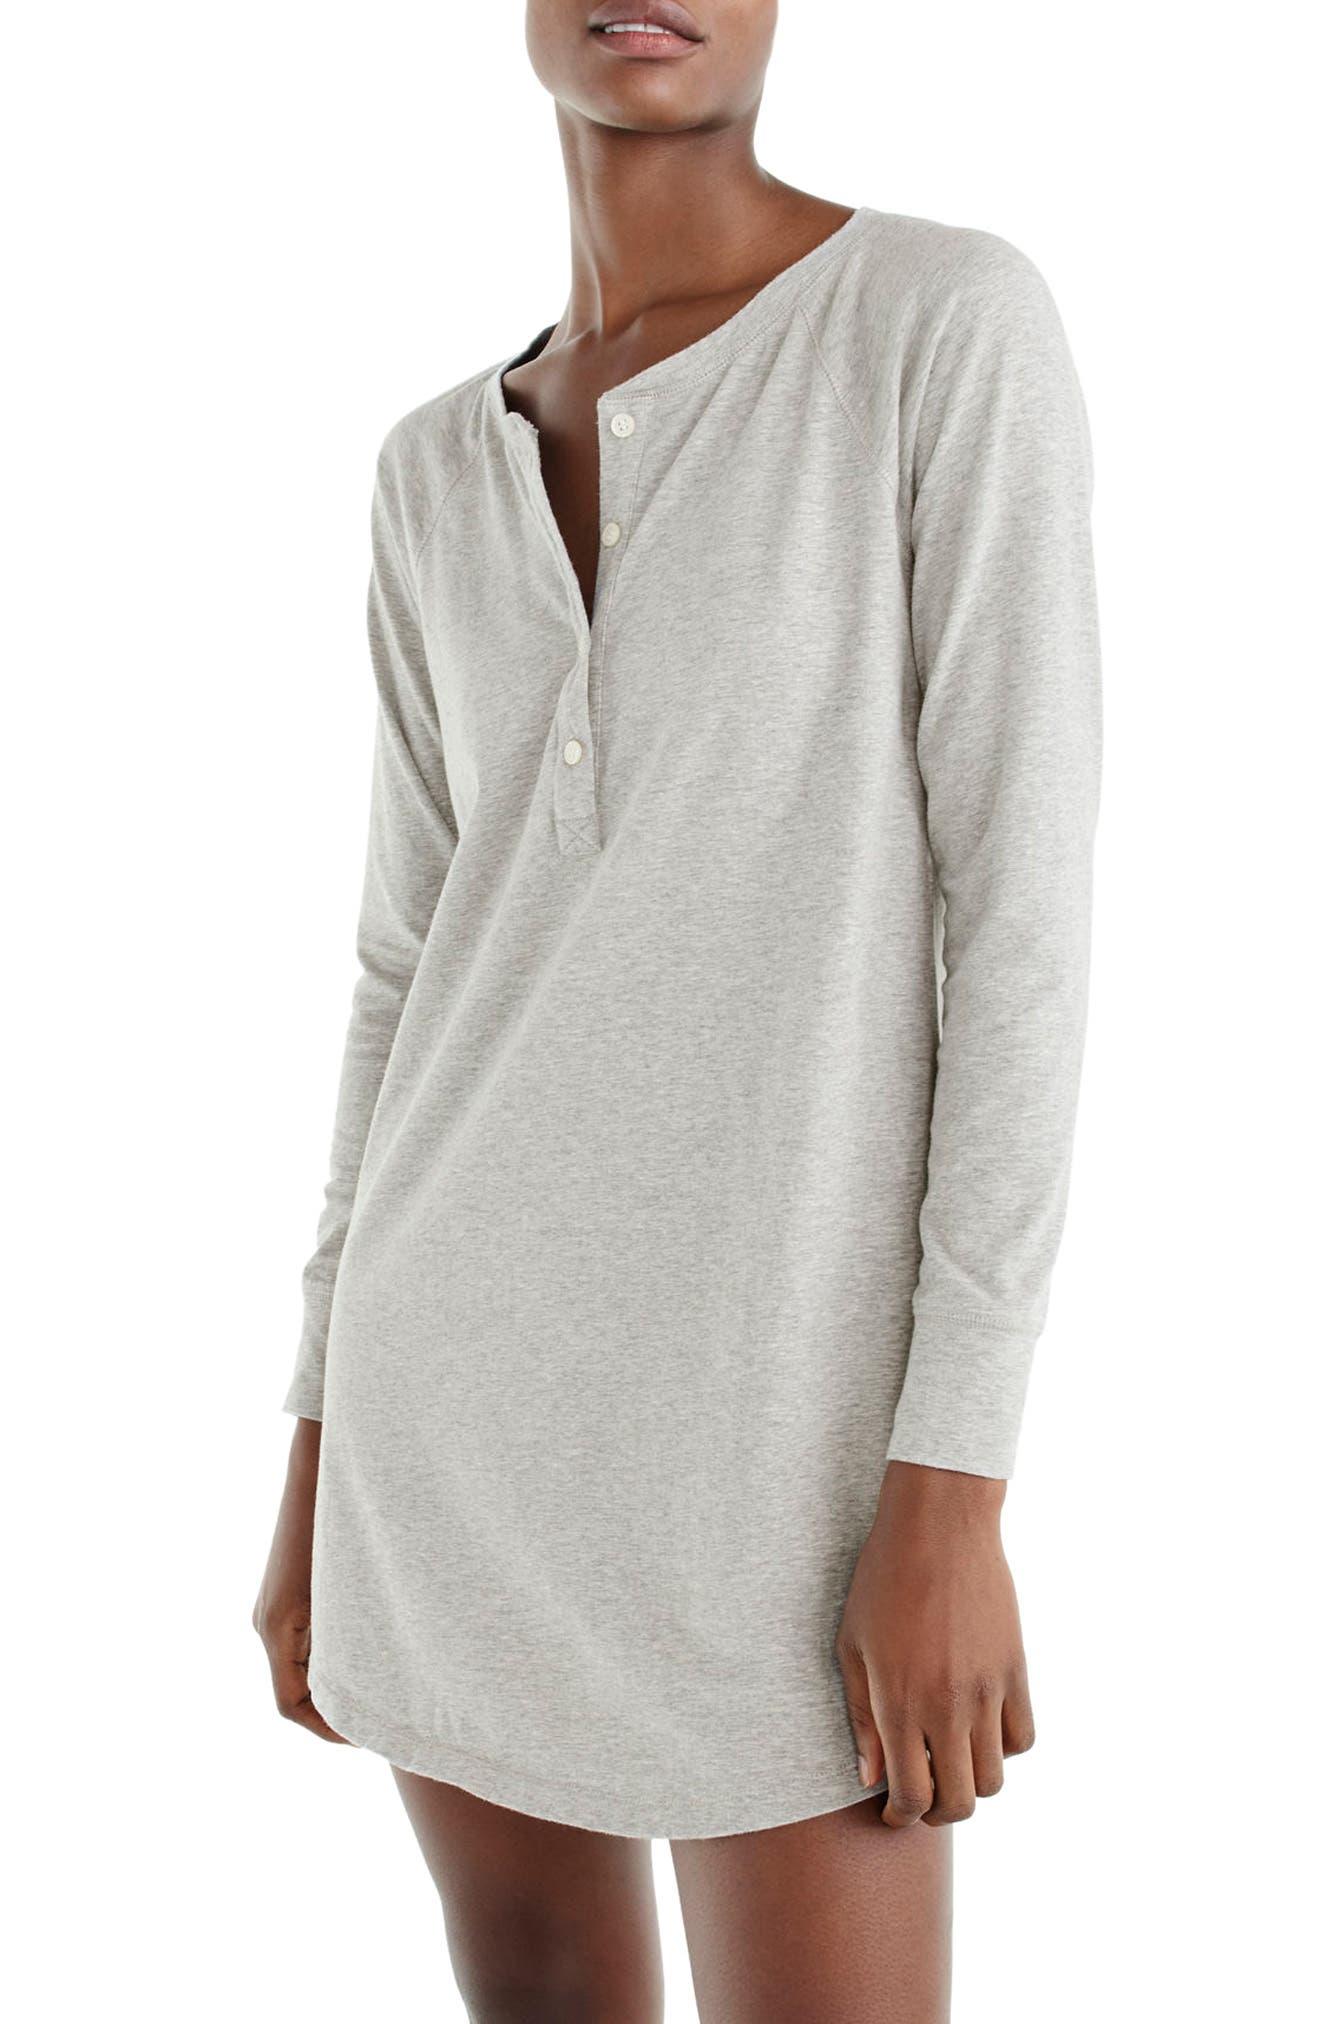 Knit Sleep Shirt,                             Main thumbnail 1, color,                             Heather Grey